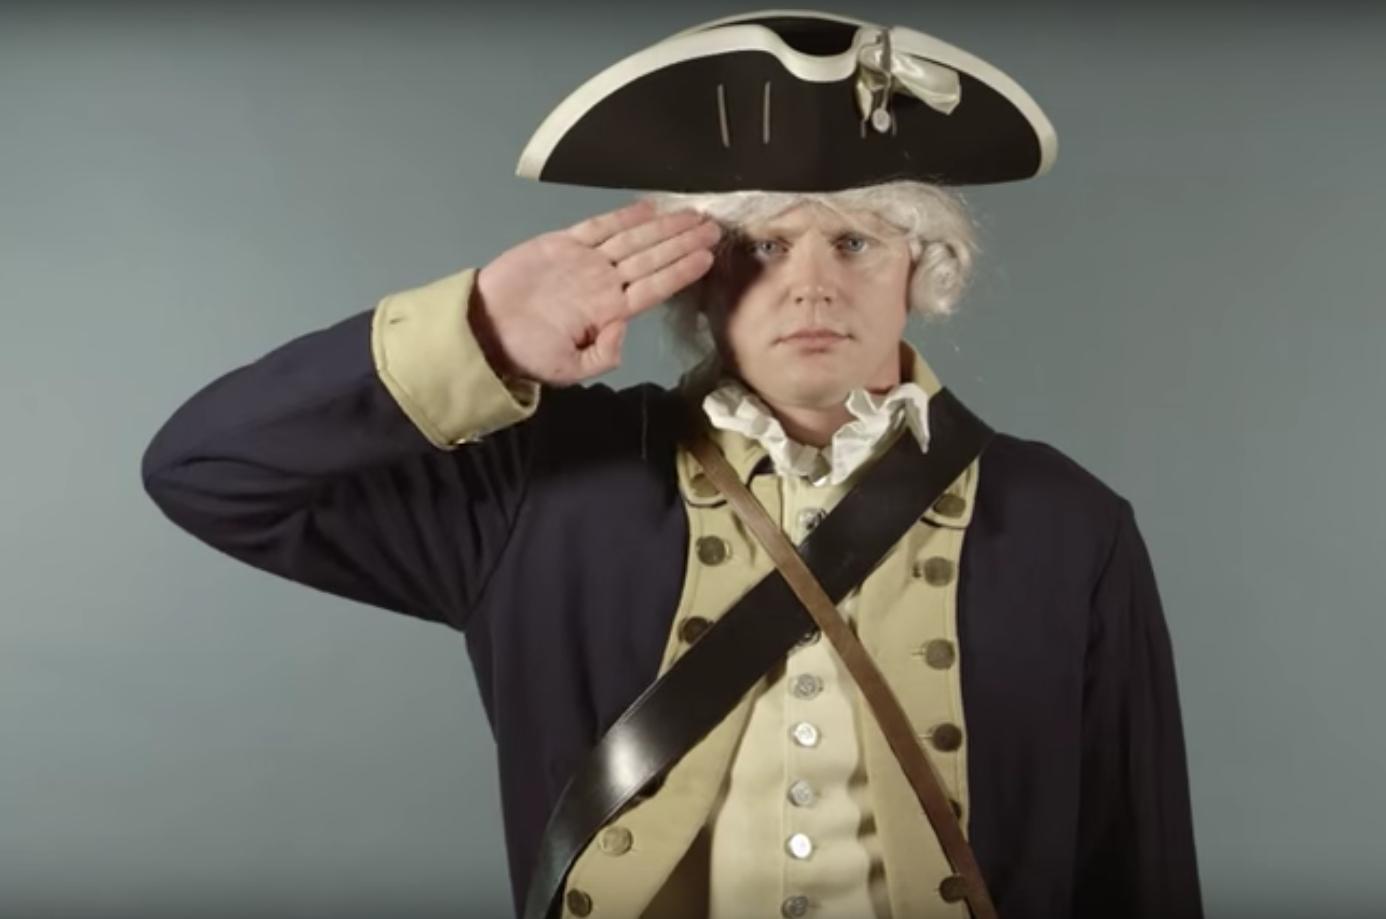 US Army Uniform Evolution